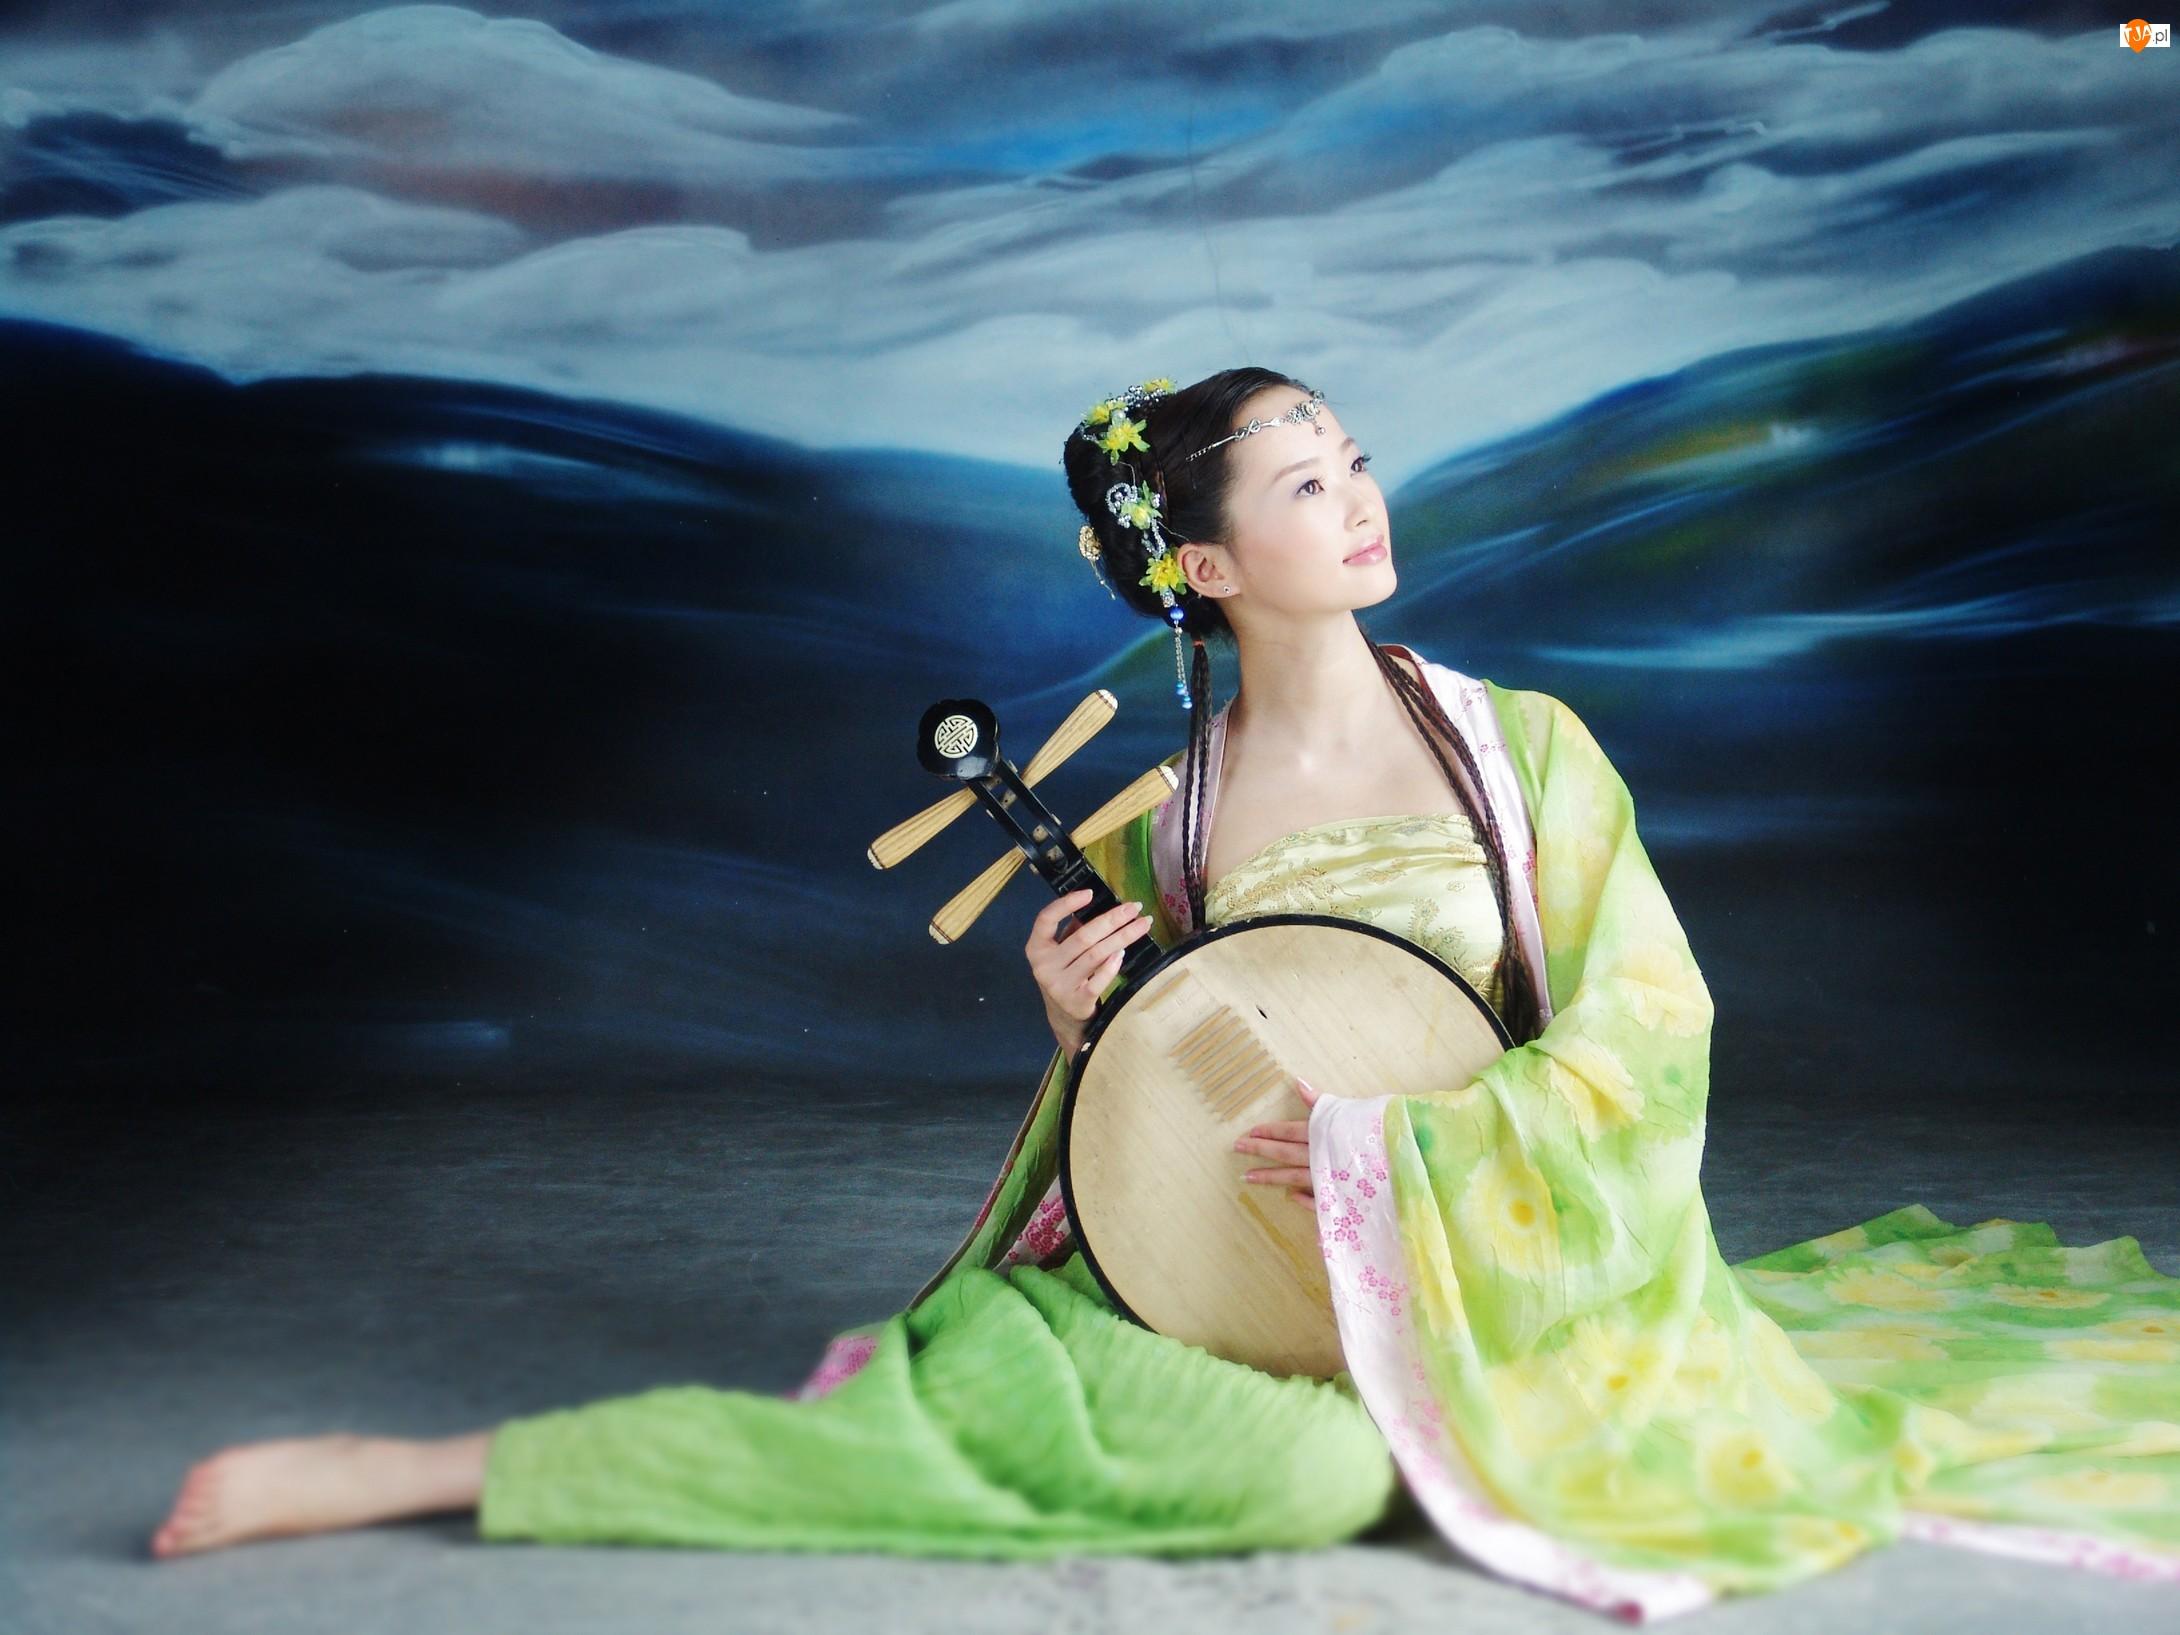 Kimono, Kobieta, Instrument